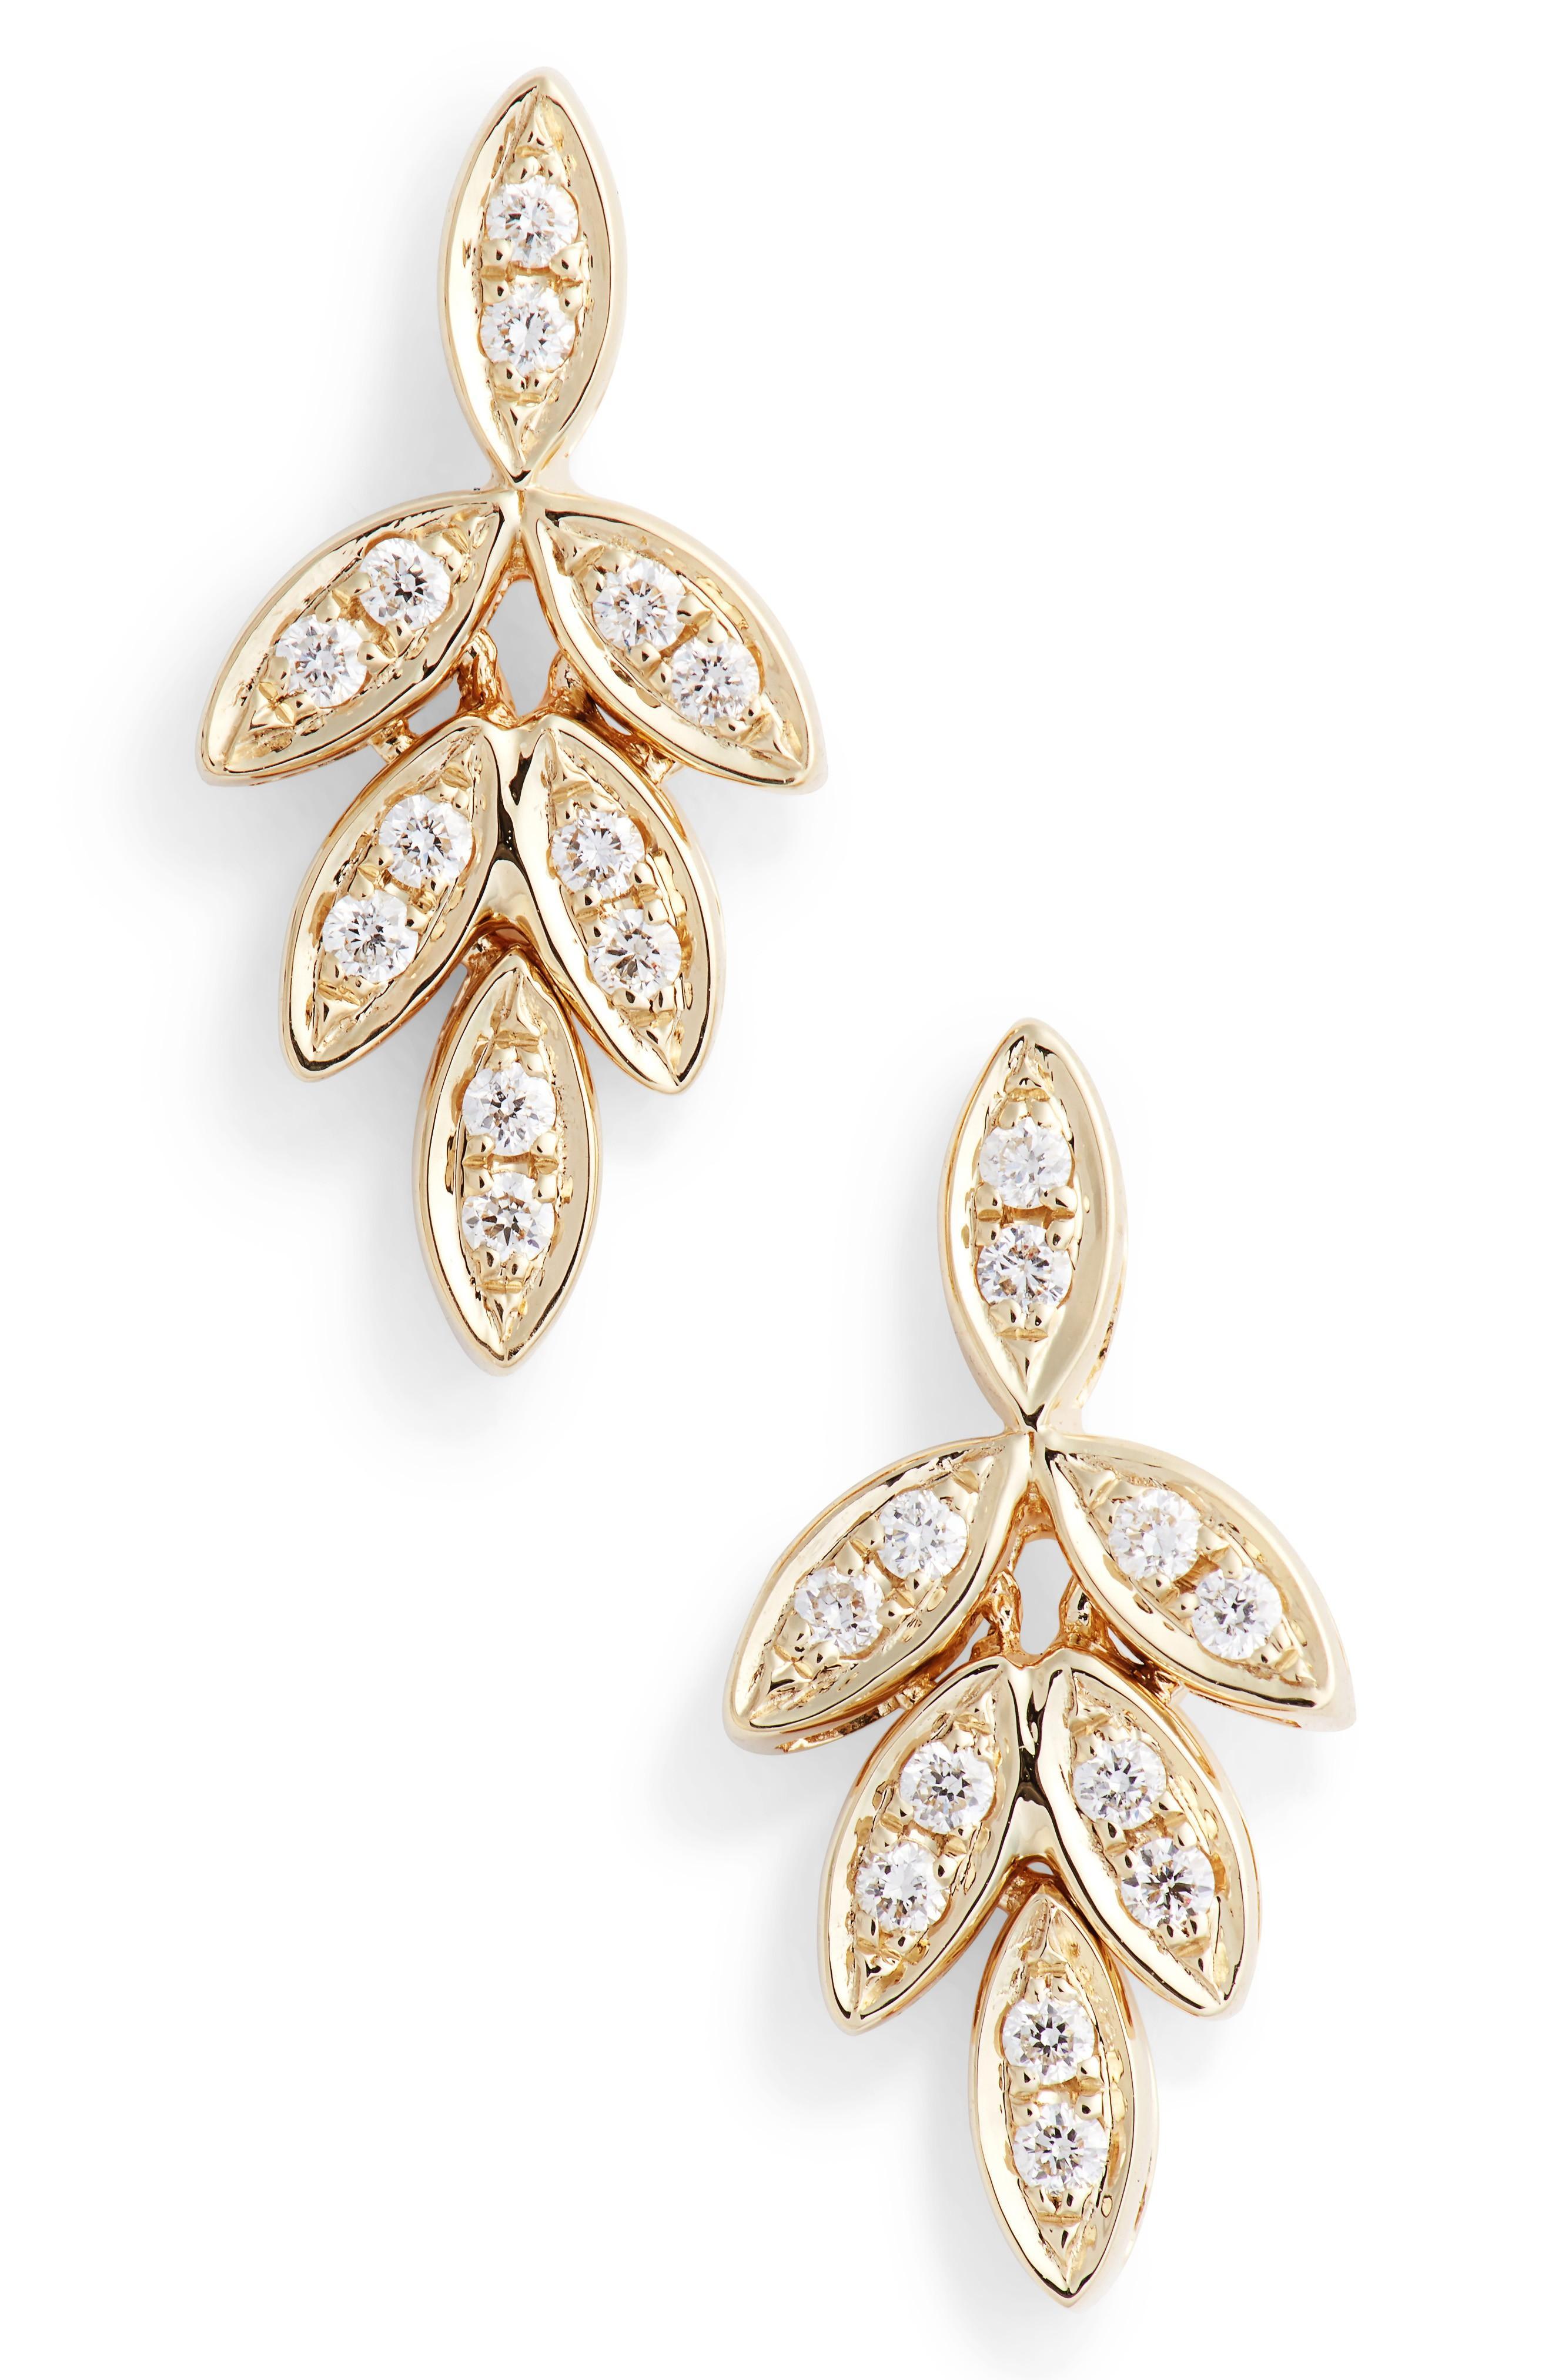 Dana Rebecca Designs Dana Rebecca Lori Paige Diamond Leaf Stud Earrings In Yellow Gold